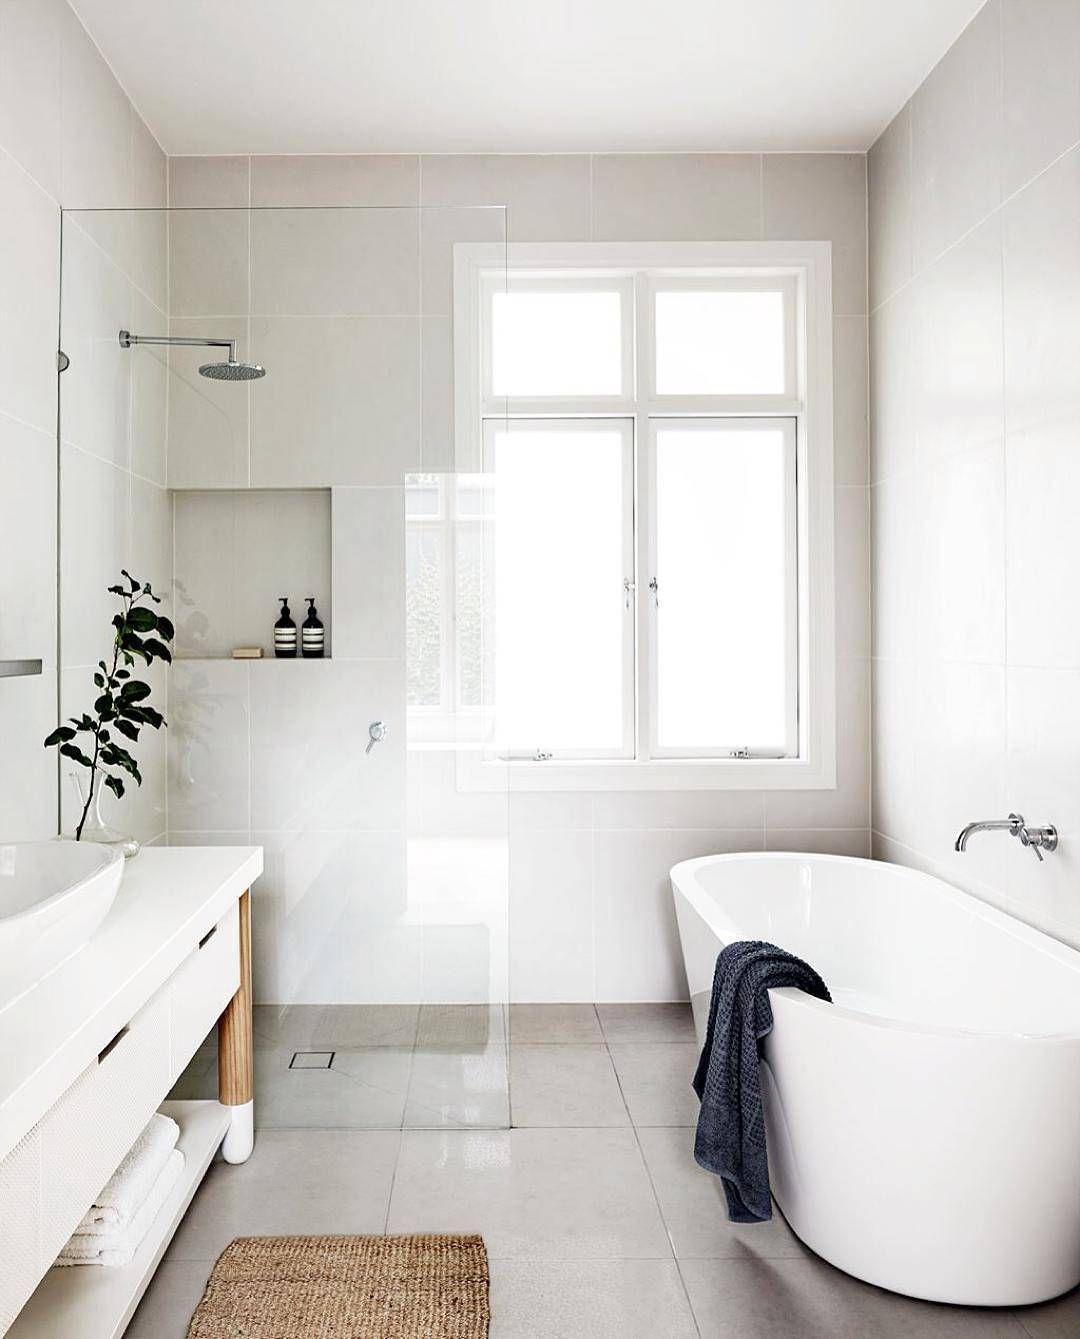 Pin by La Mini Maison on small bathroom | Pinterest | Small bathroom ...